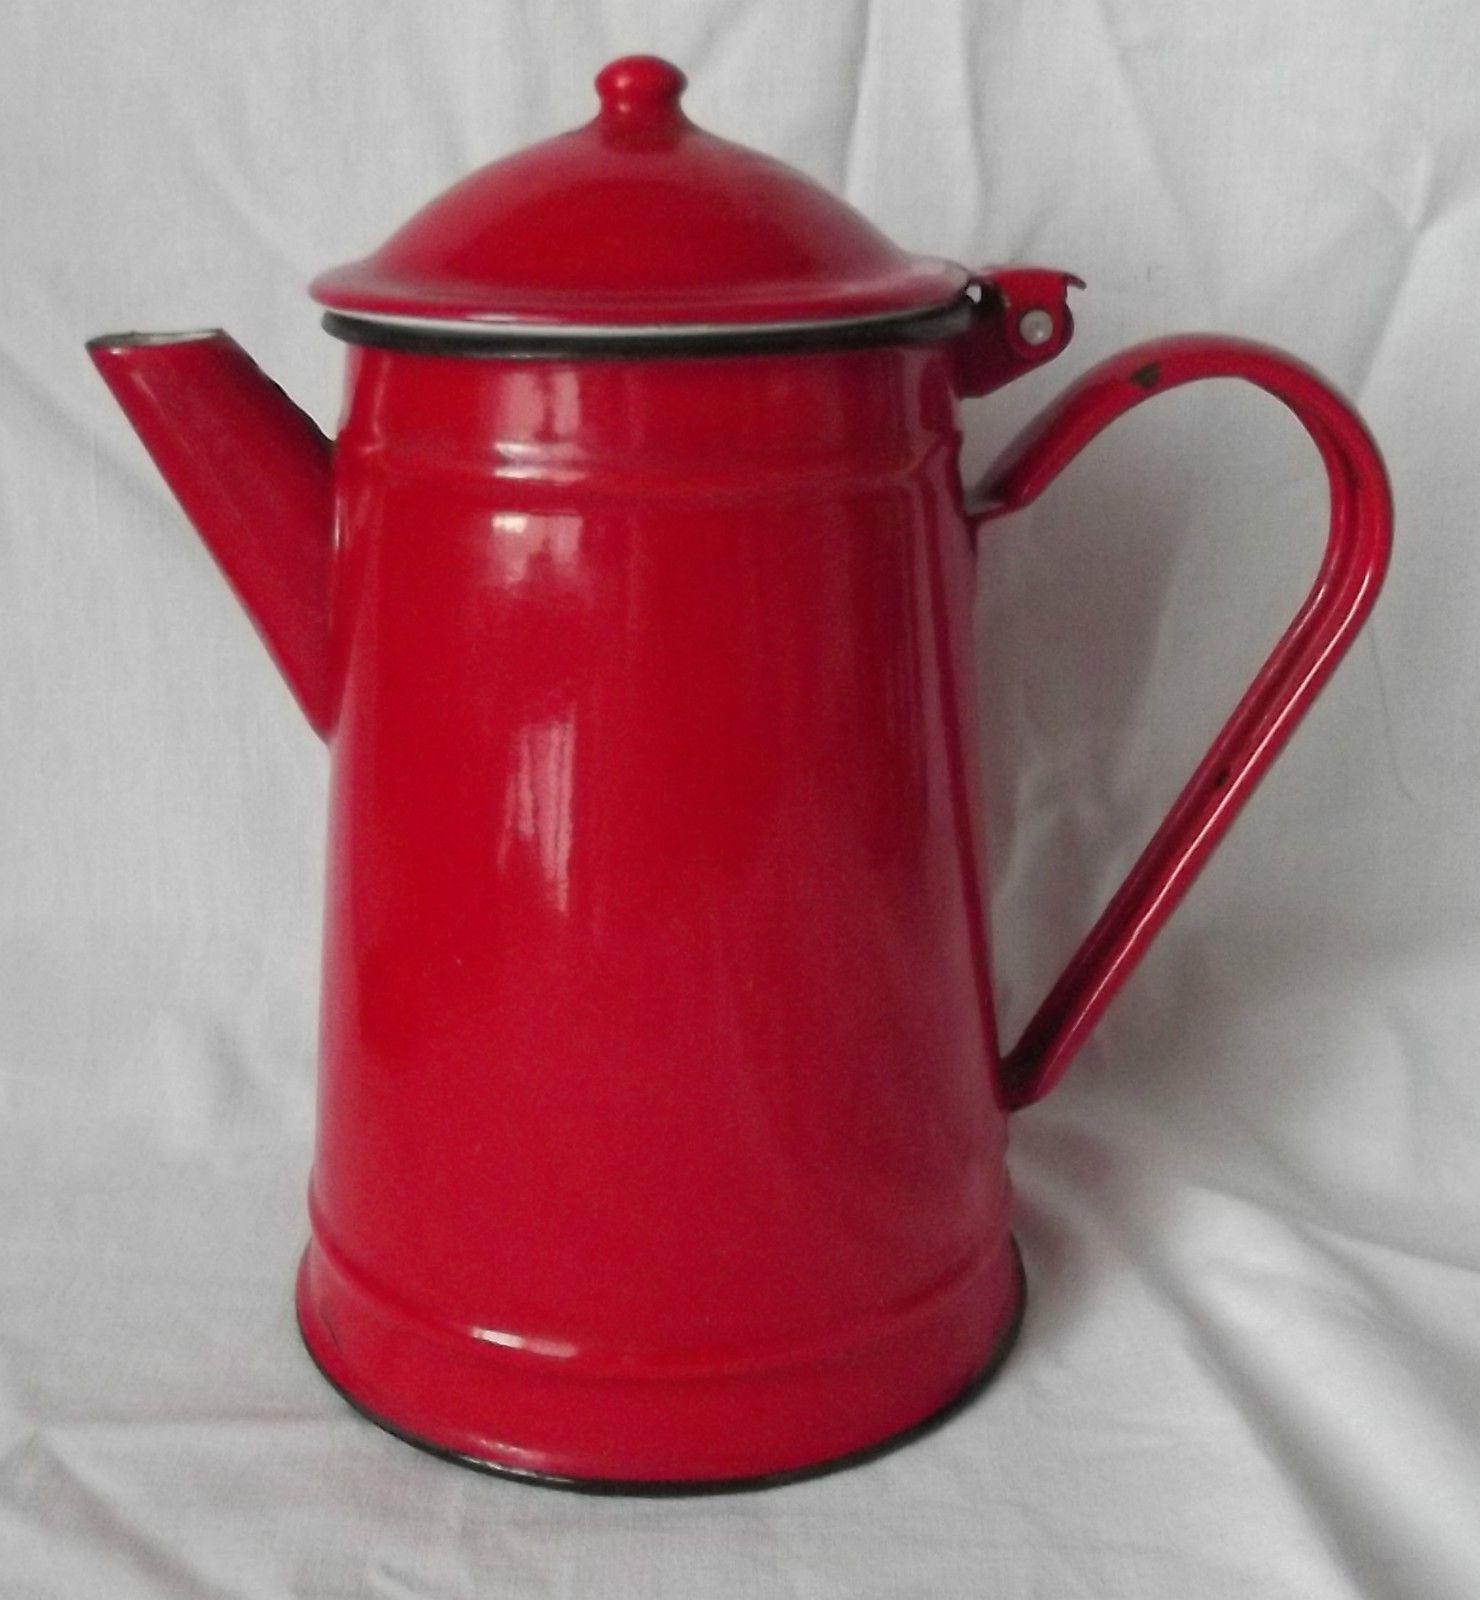 ancienne cafetiere verseuse tole emaillee rouge vintage ebay emaill pinterest t le. Black Bedroom Furniture Sets. Home Design Ideas